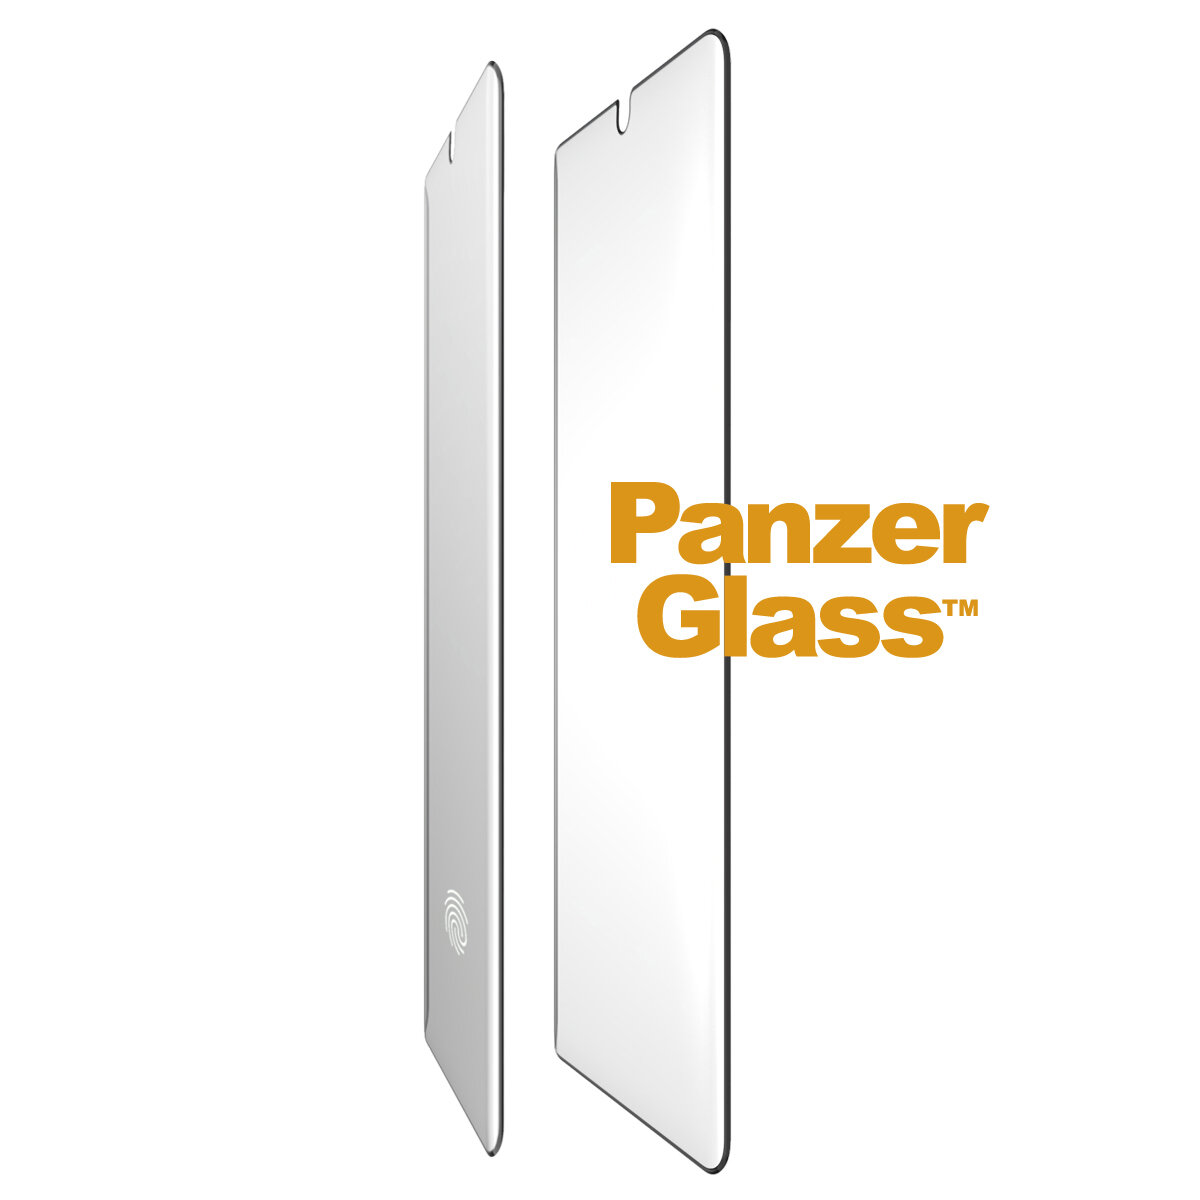 PanzerGlass Case Friendly Biometric for Galaxy S20 Ultra black